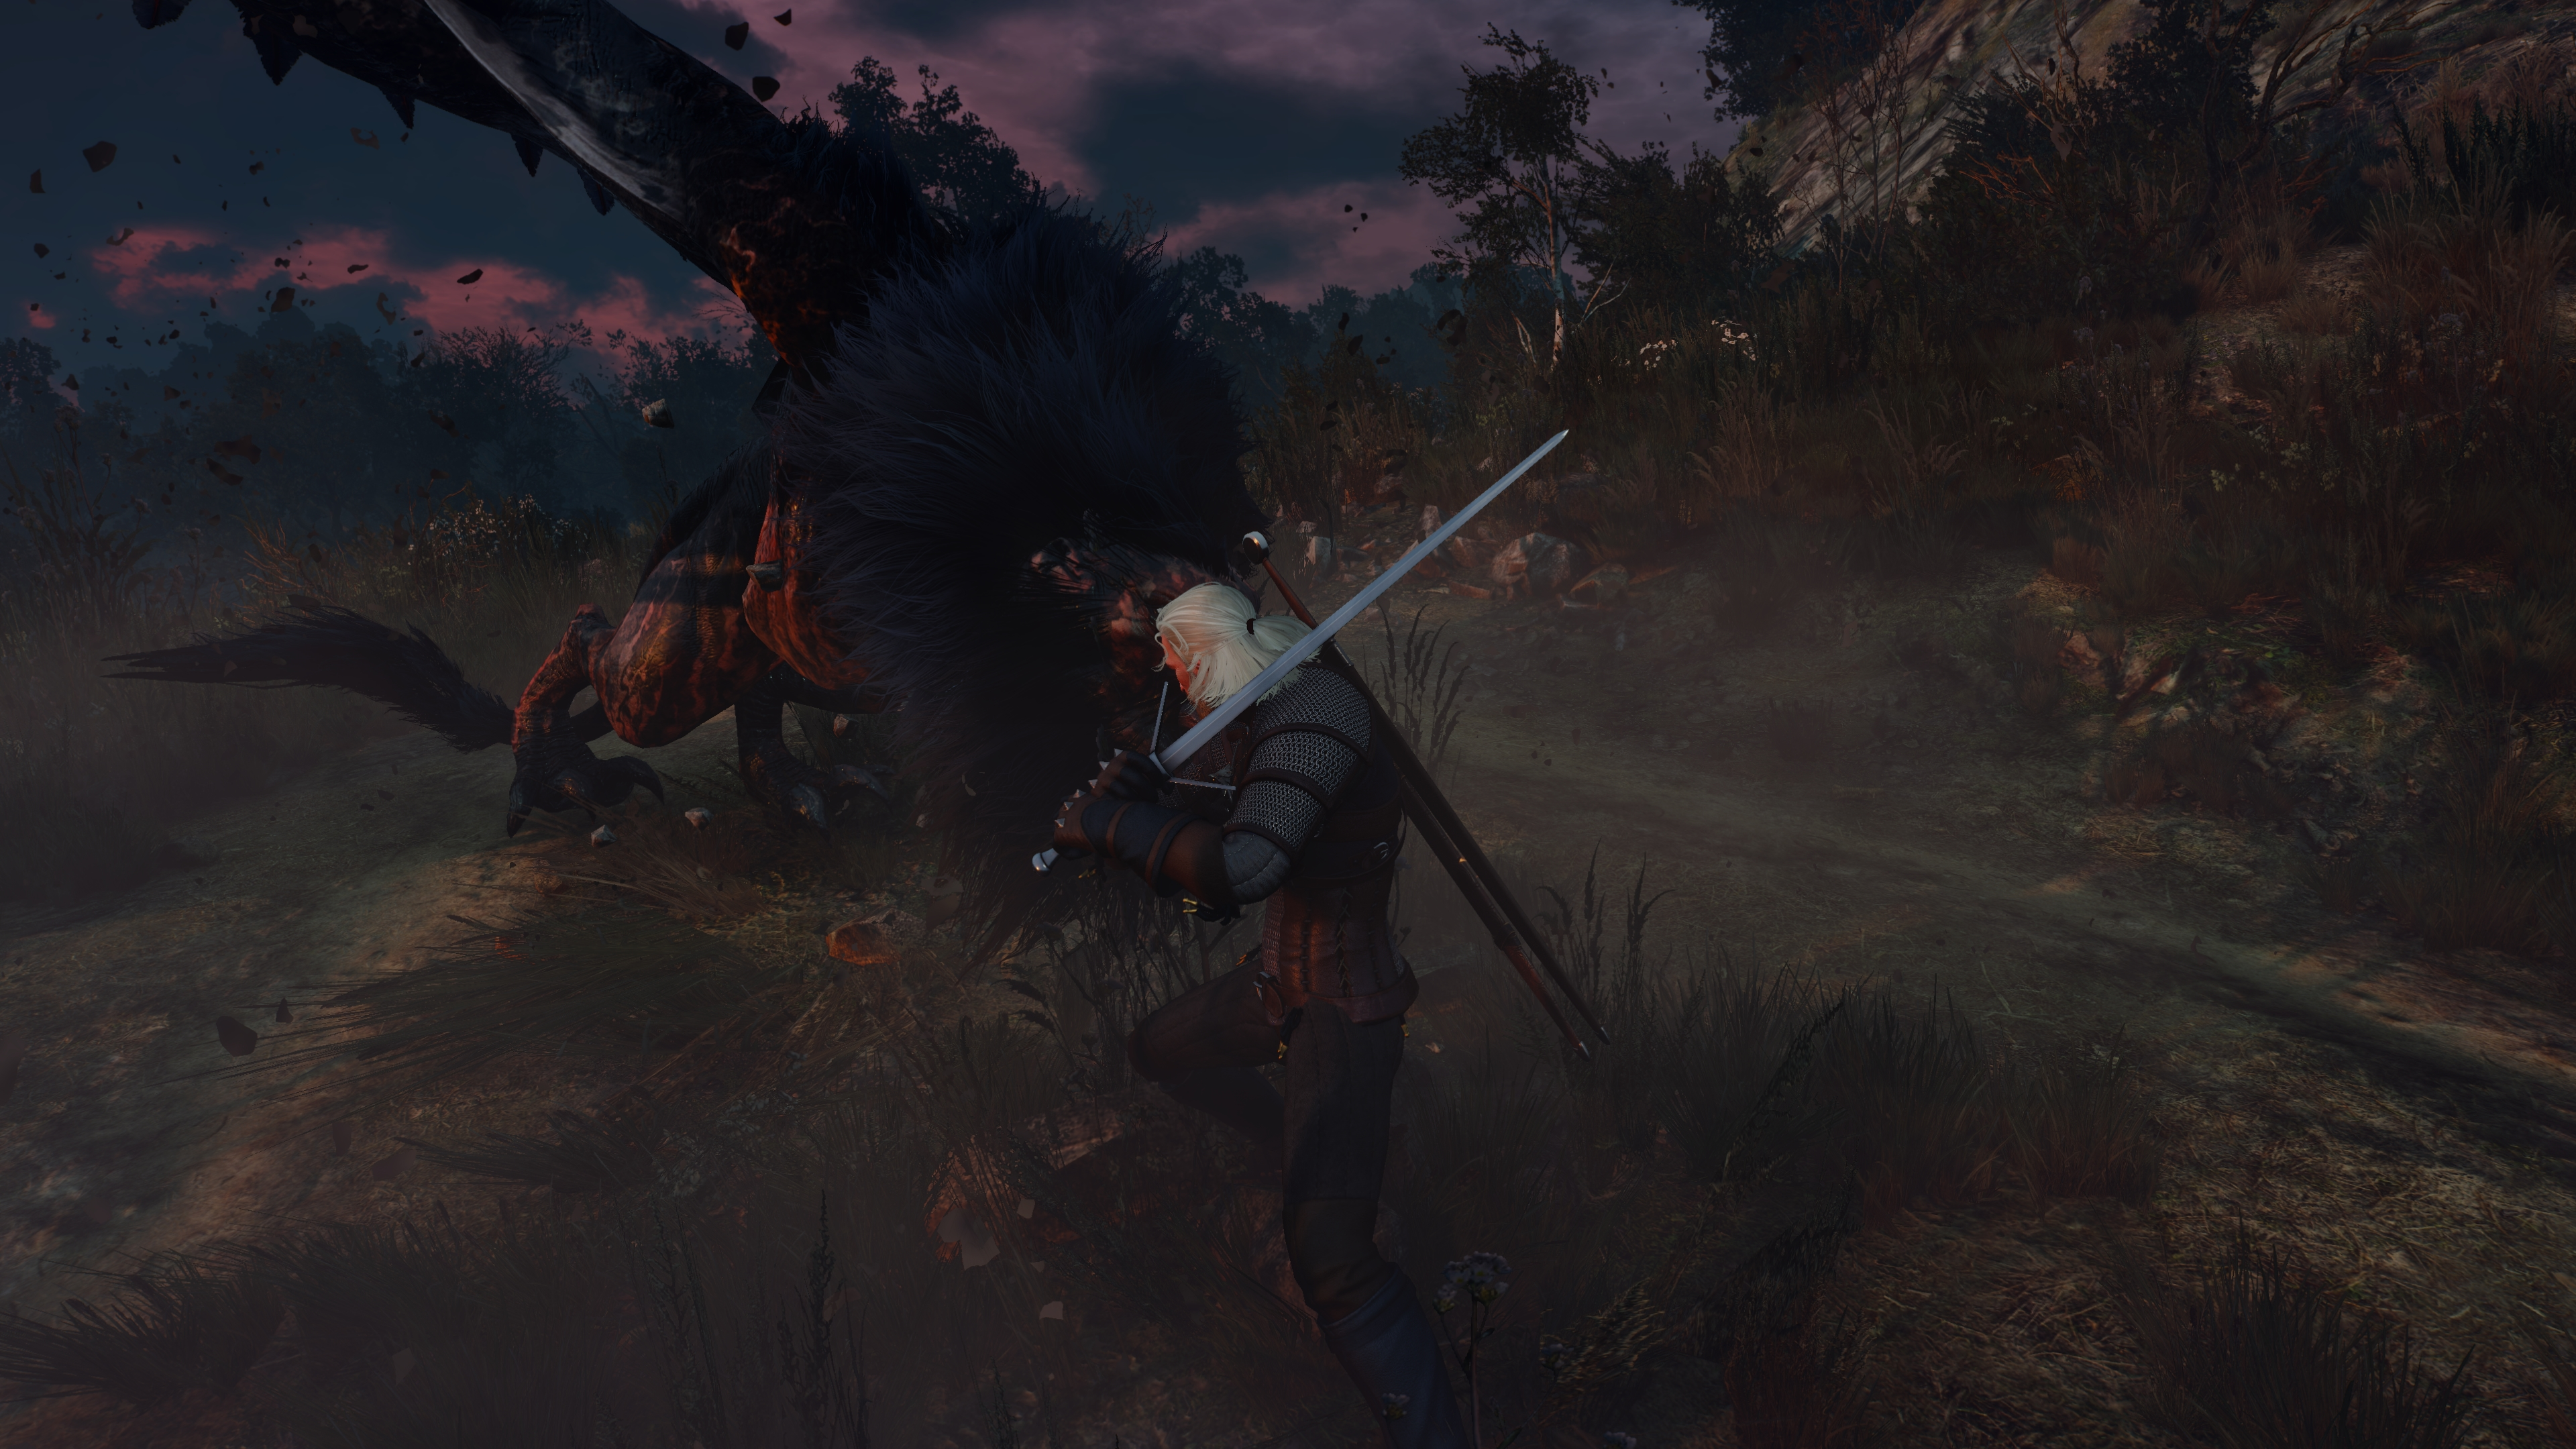 Геральт - Witcher 3: Wild Hunt, the Wild Hunt